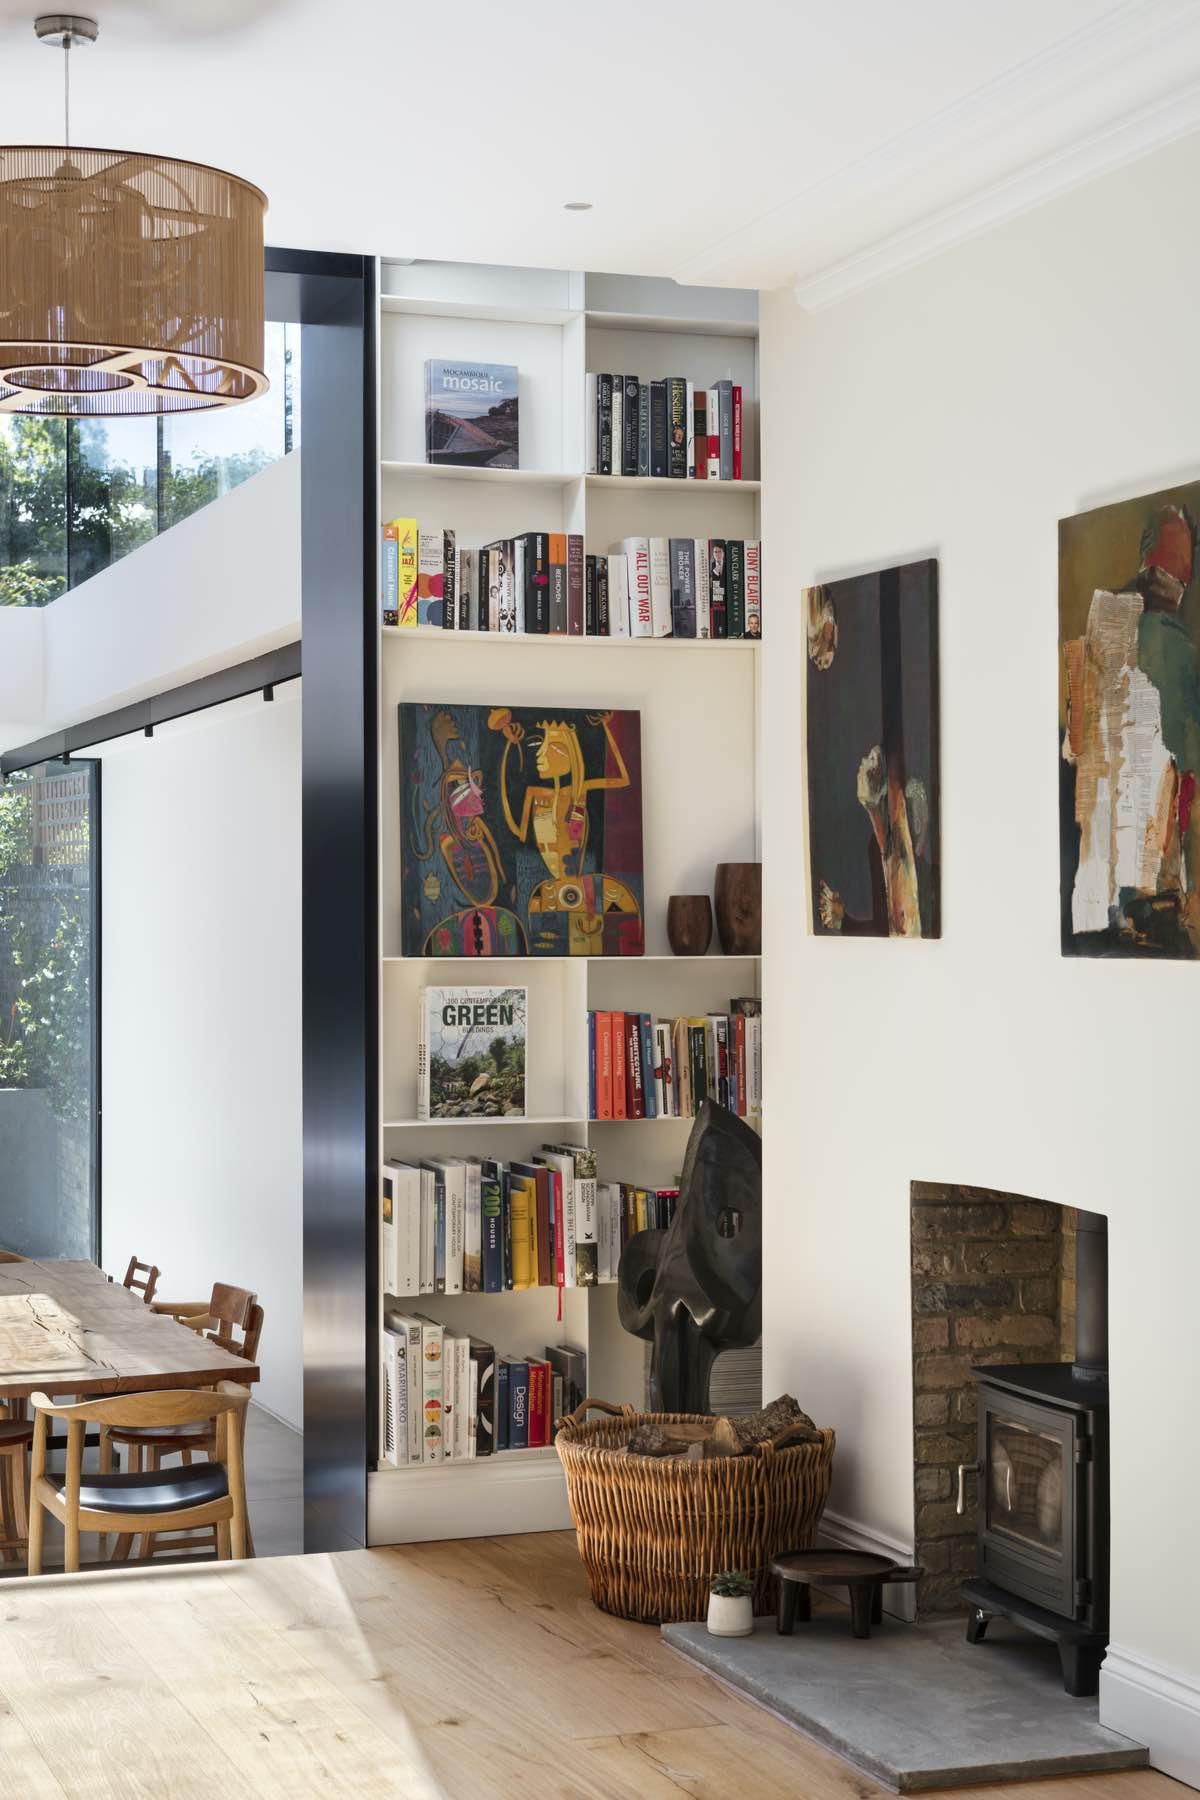 office area with many books inside the bookshelf